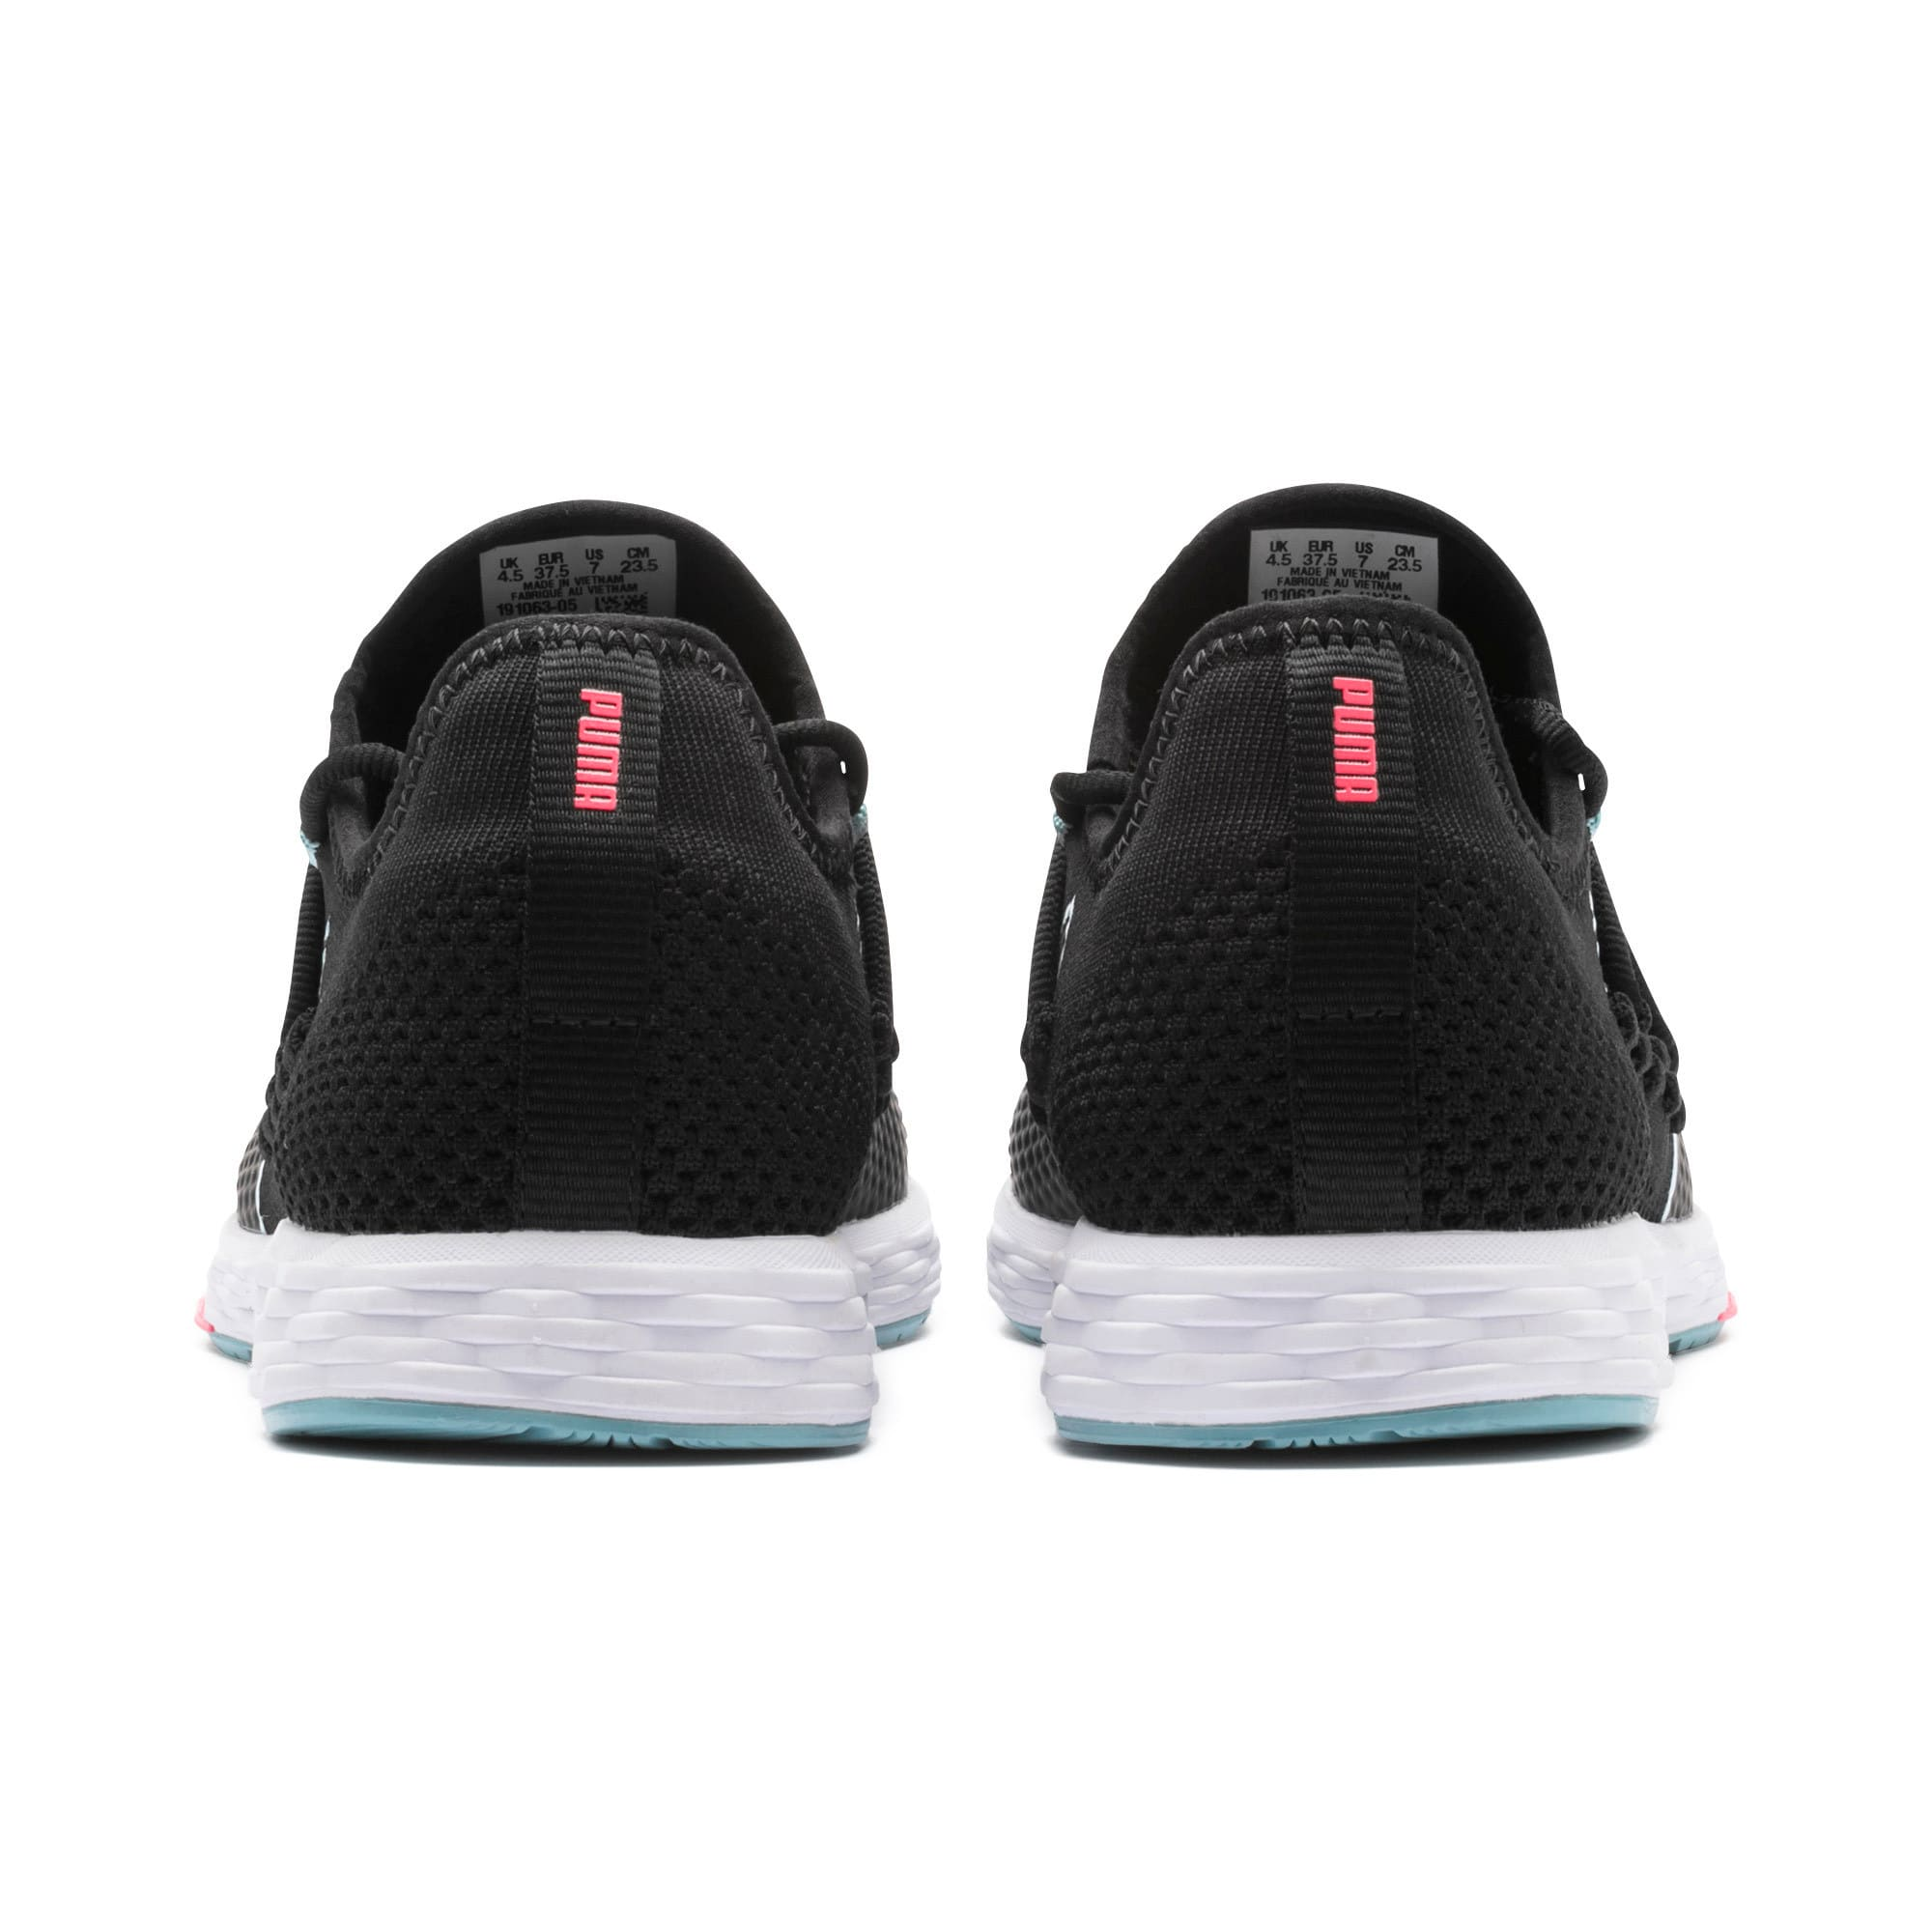 Thumbnail 4 of SPEED RACER Women's Running Shoes, Black-Milky Blue-Pink Alert, medium